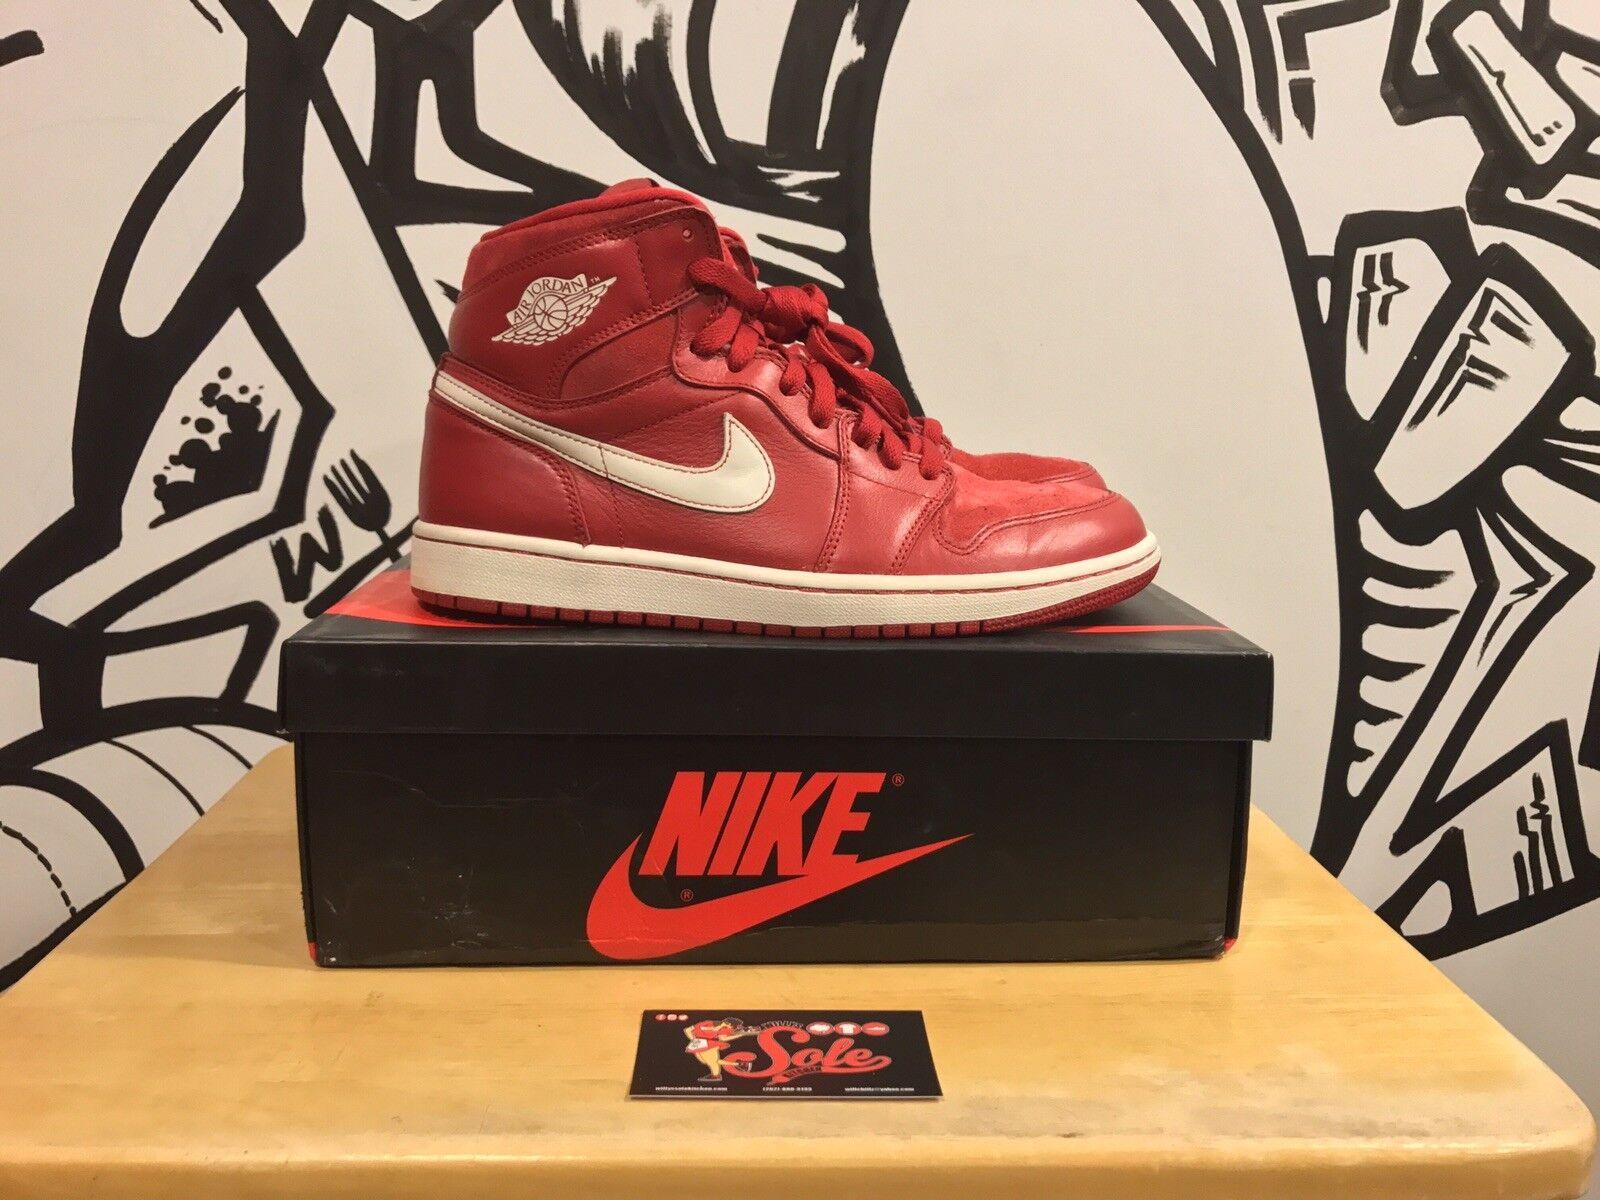 Air Jordan 1 Retro High OG  Euro Gym Red  Size 8 Men